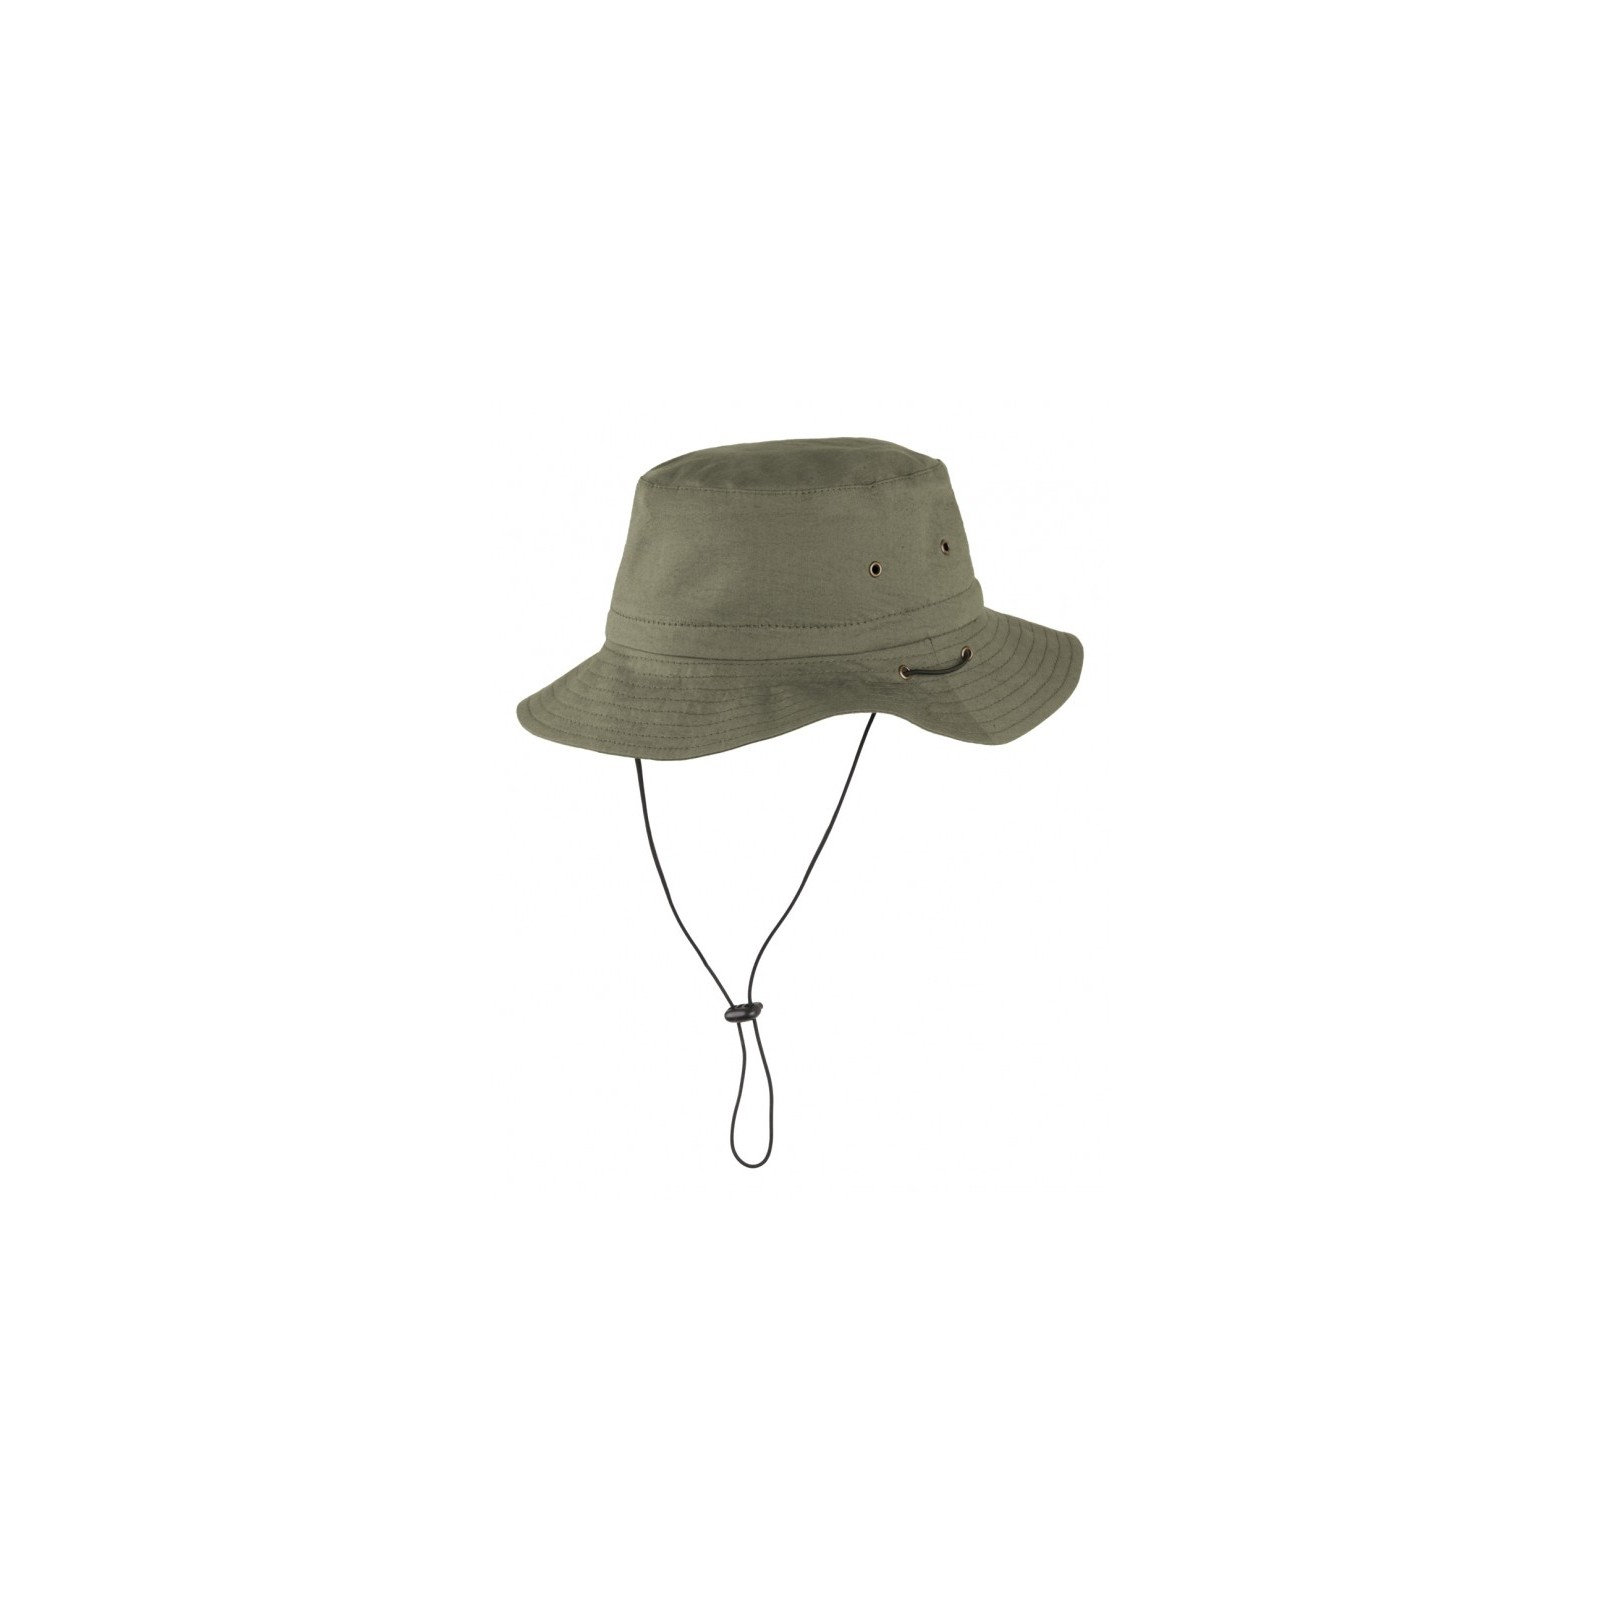 Scippis Bush Hiker hat